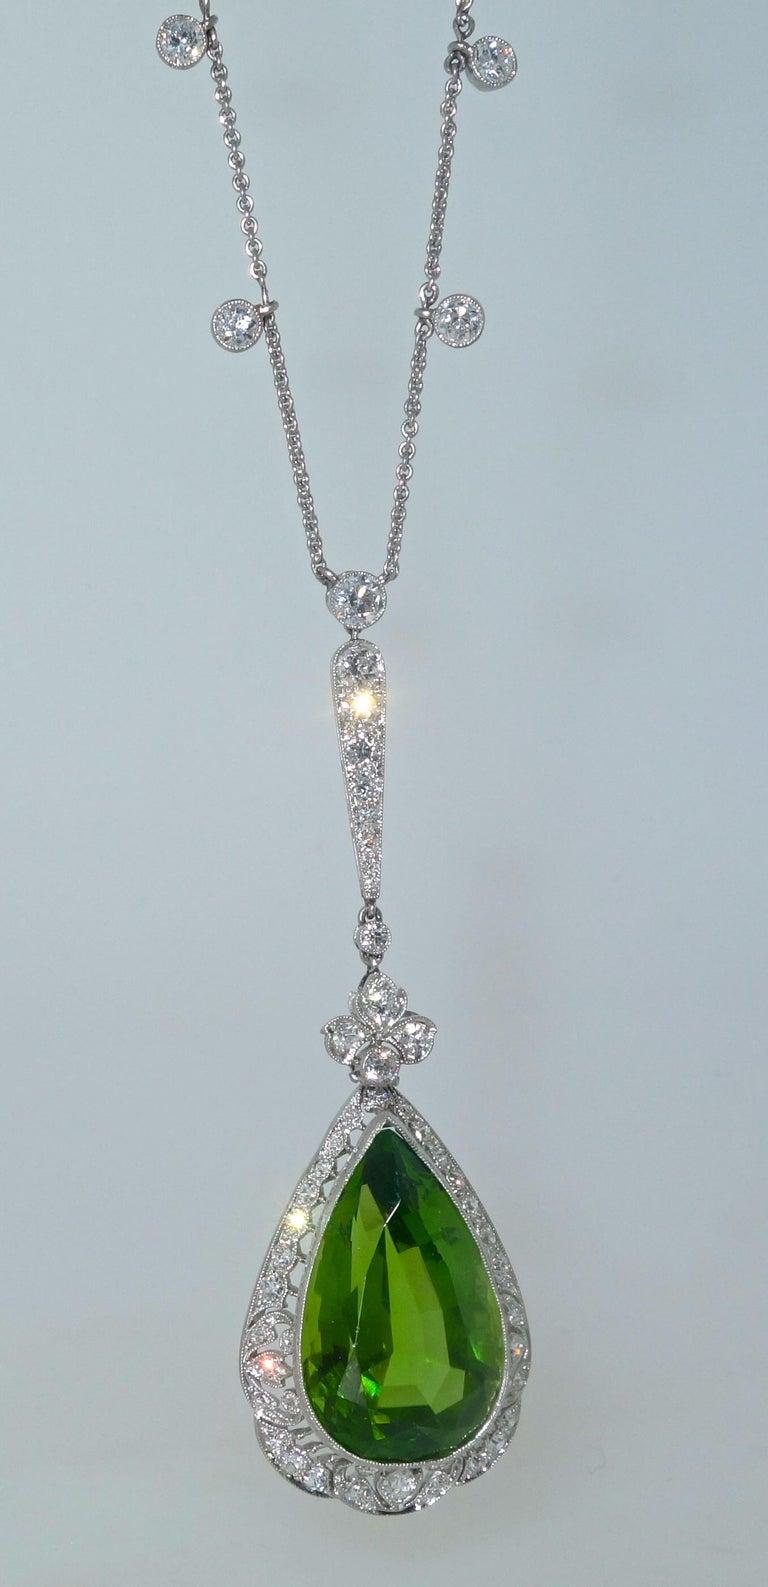 Edwardian Peridot and Diamond Necklace, Shreve & Co., circa 1918 For Sale 1